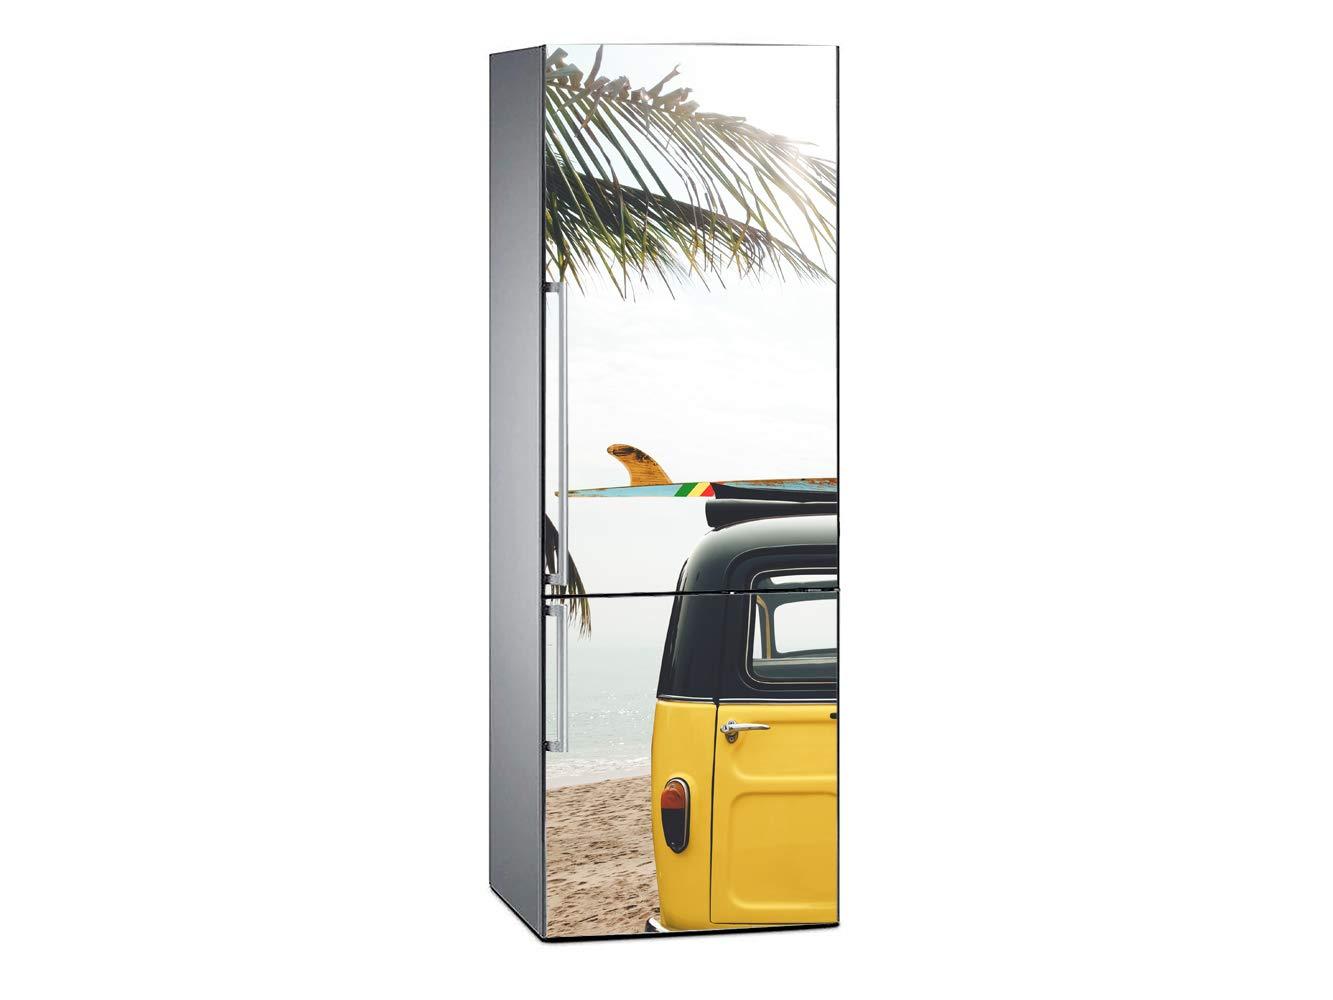 Oedim Vinilo para Frigorífico Furgoneta en Playa Tropical 185x70cm ...